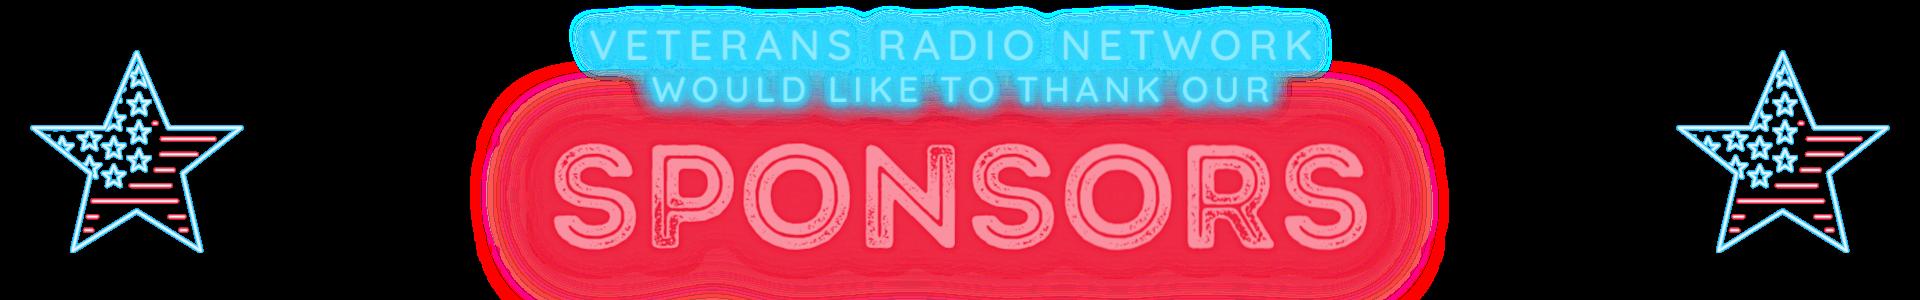 Sponsors Banner VRN transparant